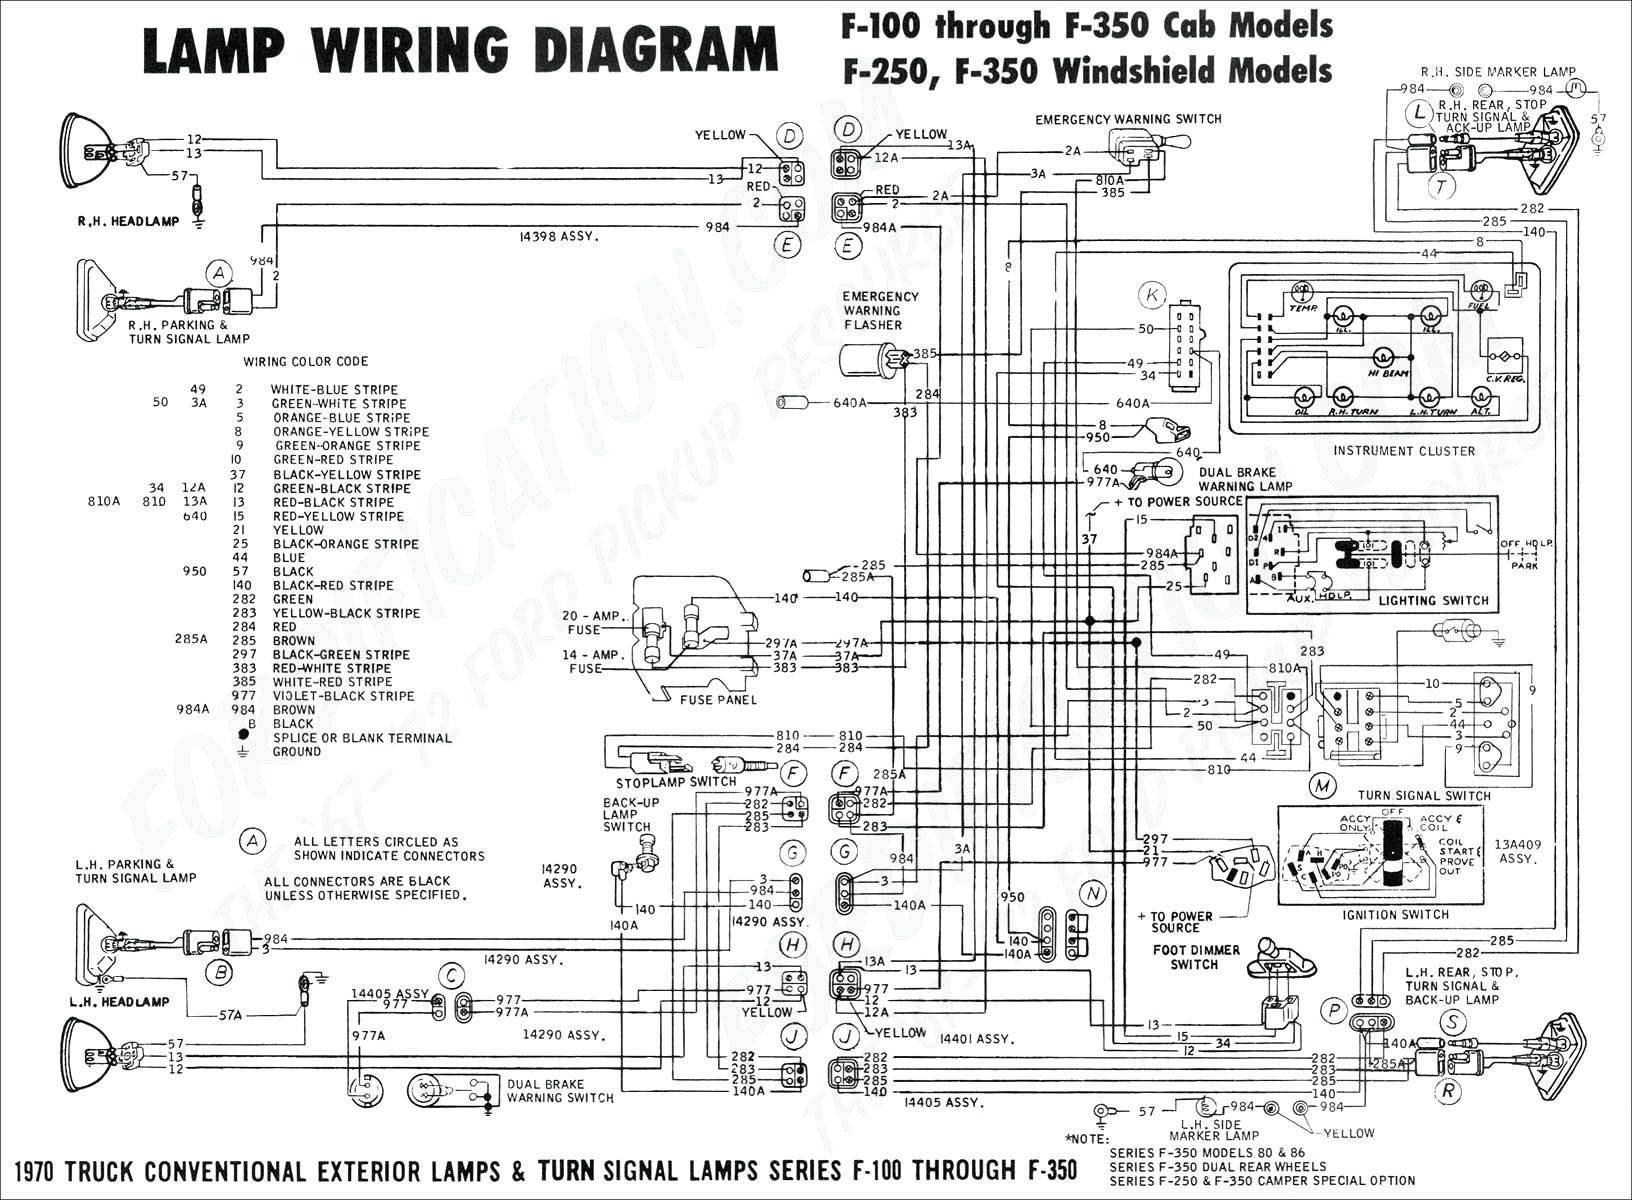 1986 toyota Pickup Engine Diagram 1986 toyota Pickup Trailer Wiring Wiring Diagram Center • Of 1986 toyota Pickup Engine Diagram